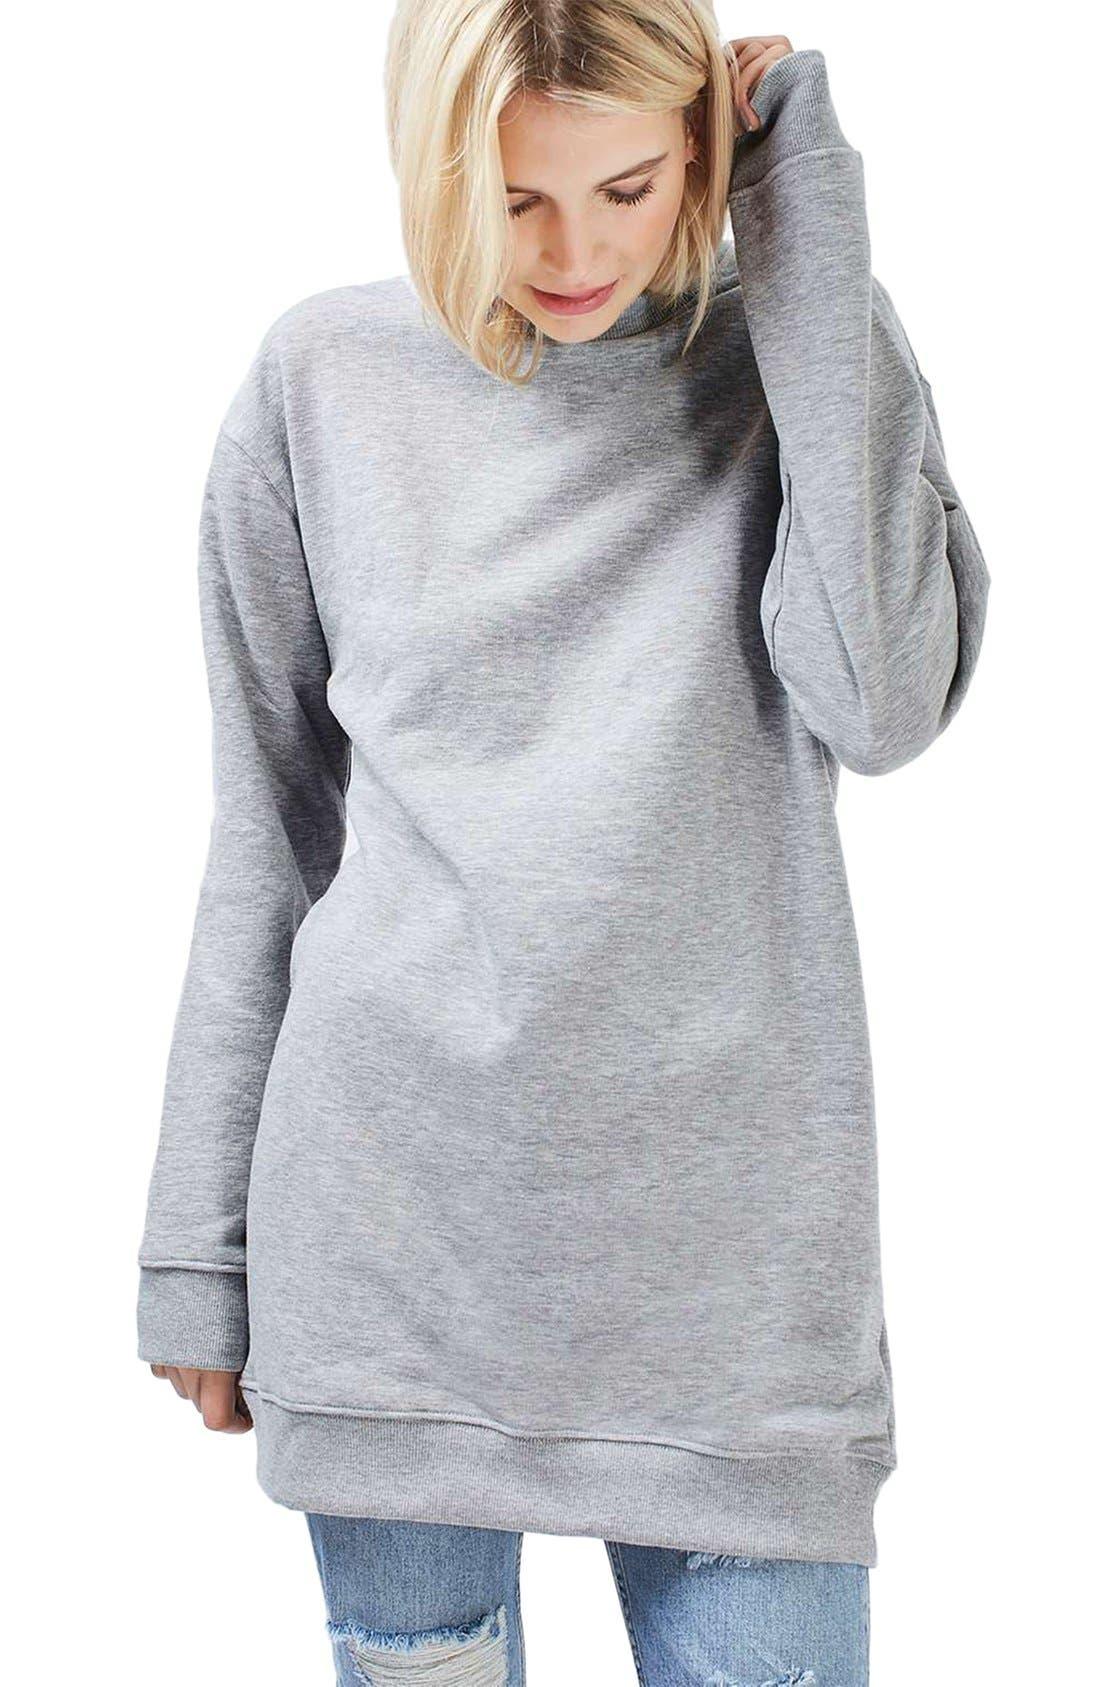 Alternate Image 1 Selected - Topshop Sweatshirt Tunic